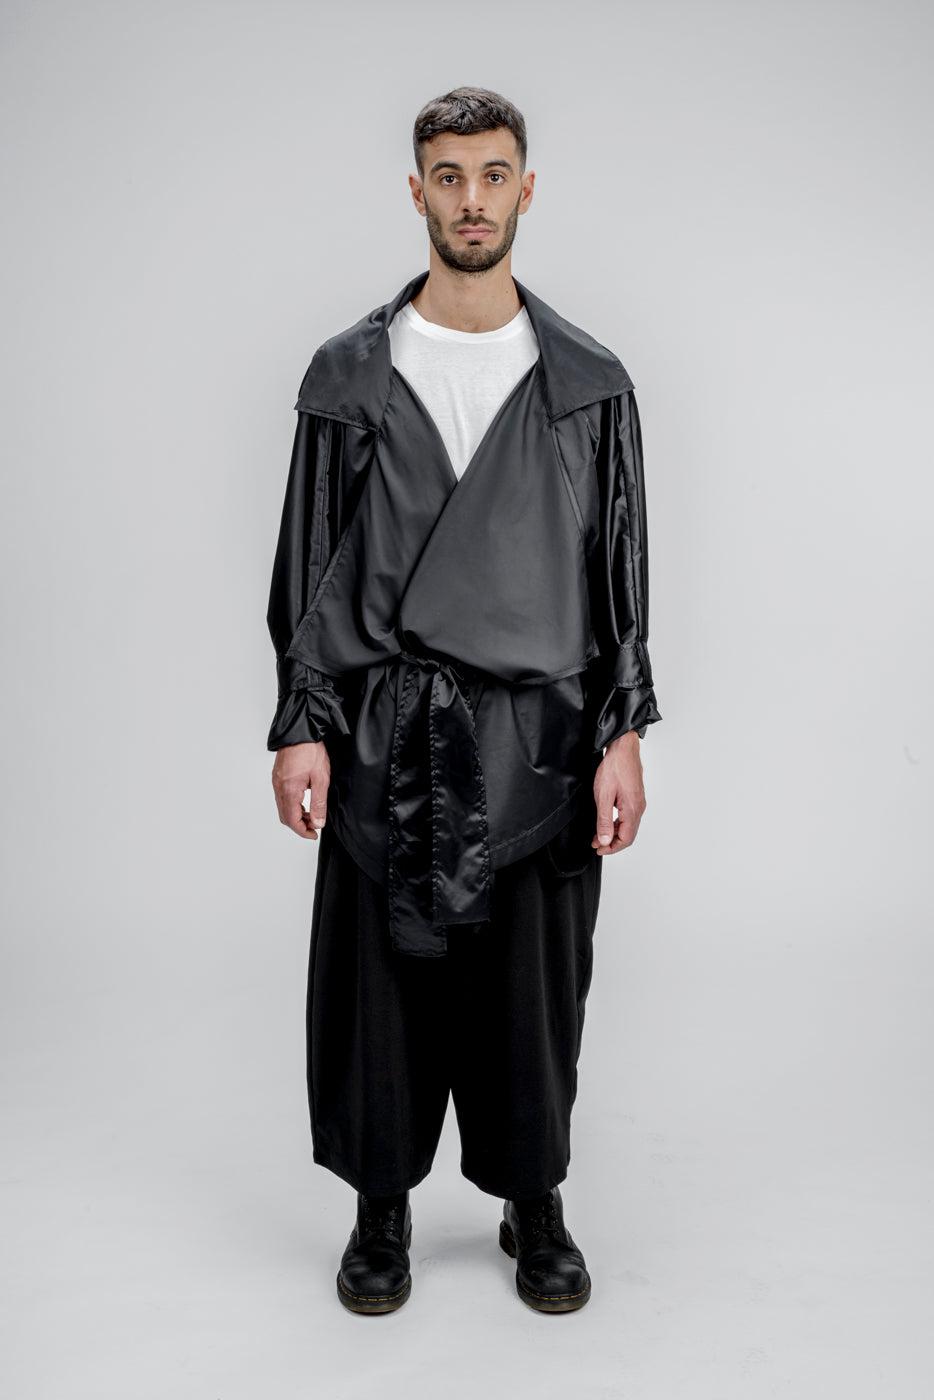 ALEX Black/Olive